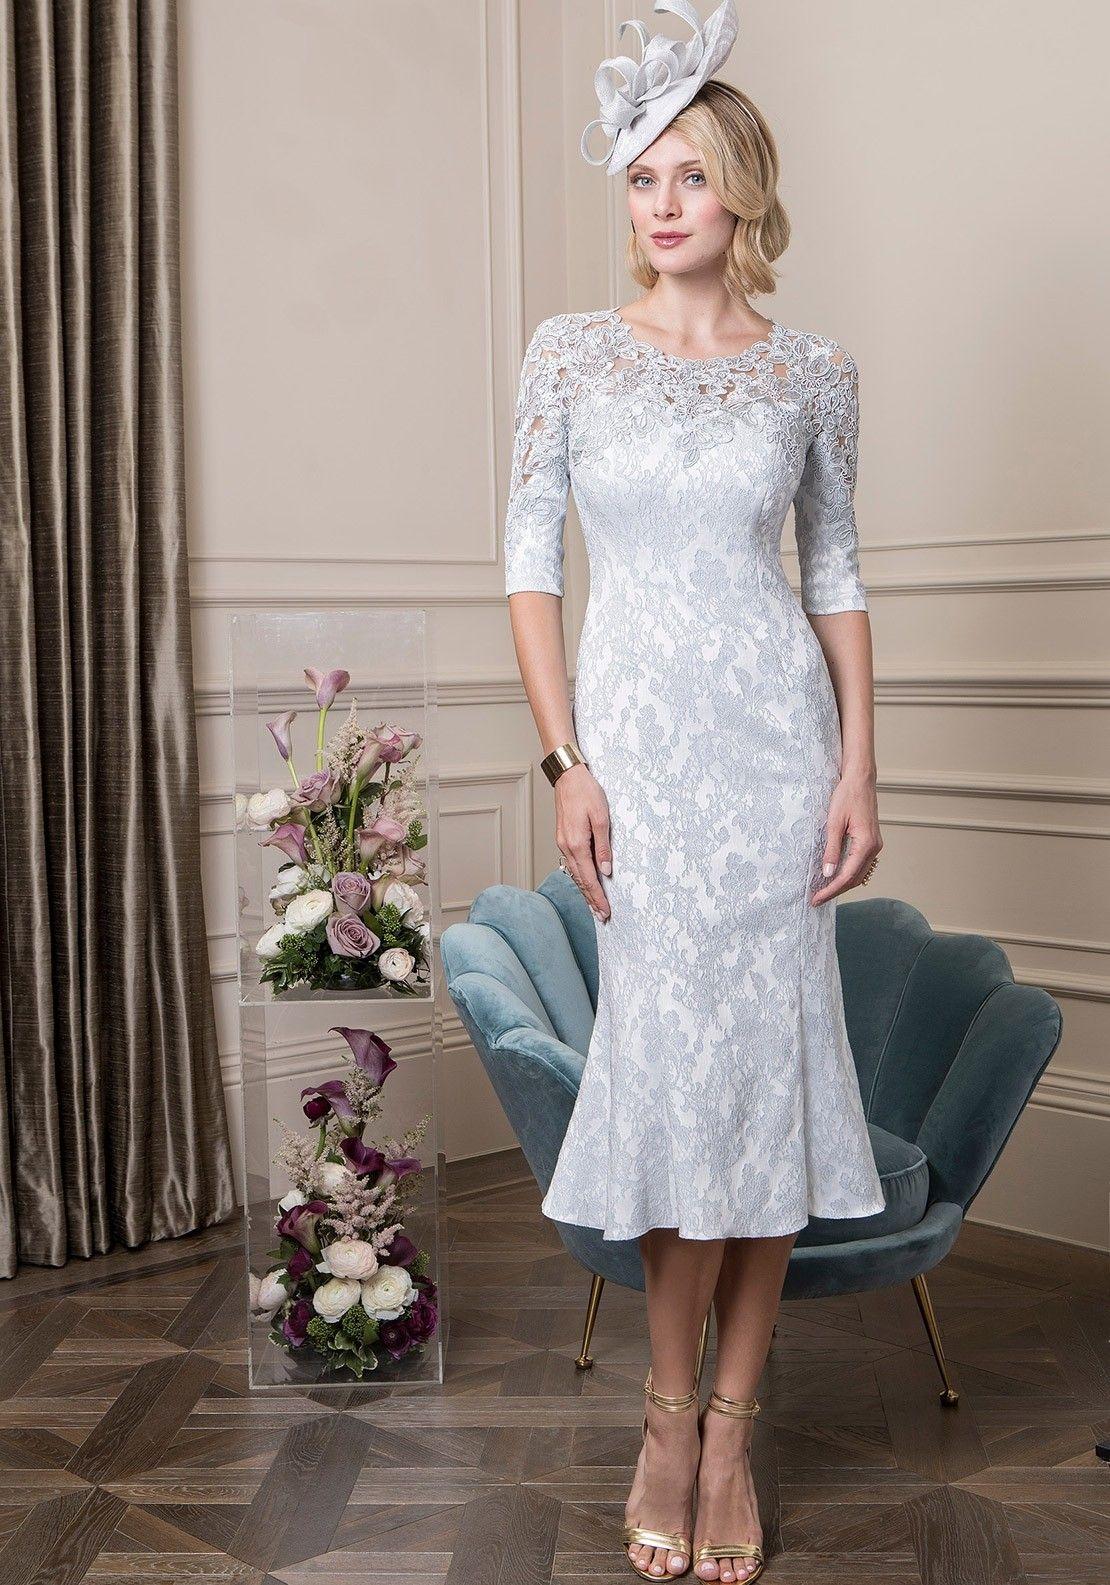 John Charles Jacquard Frill Hem Dress Platinum Bride Clothes Mother Of The Bride Dresses Groom Outfit